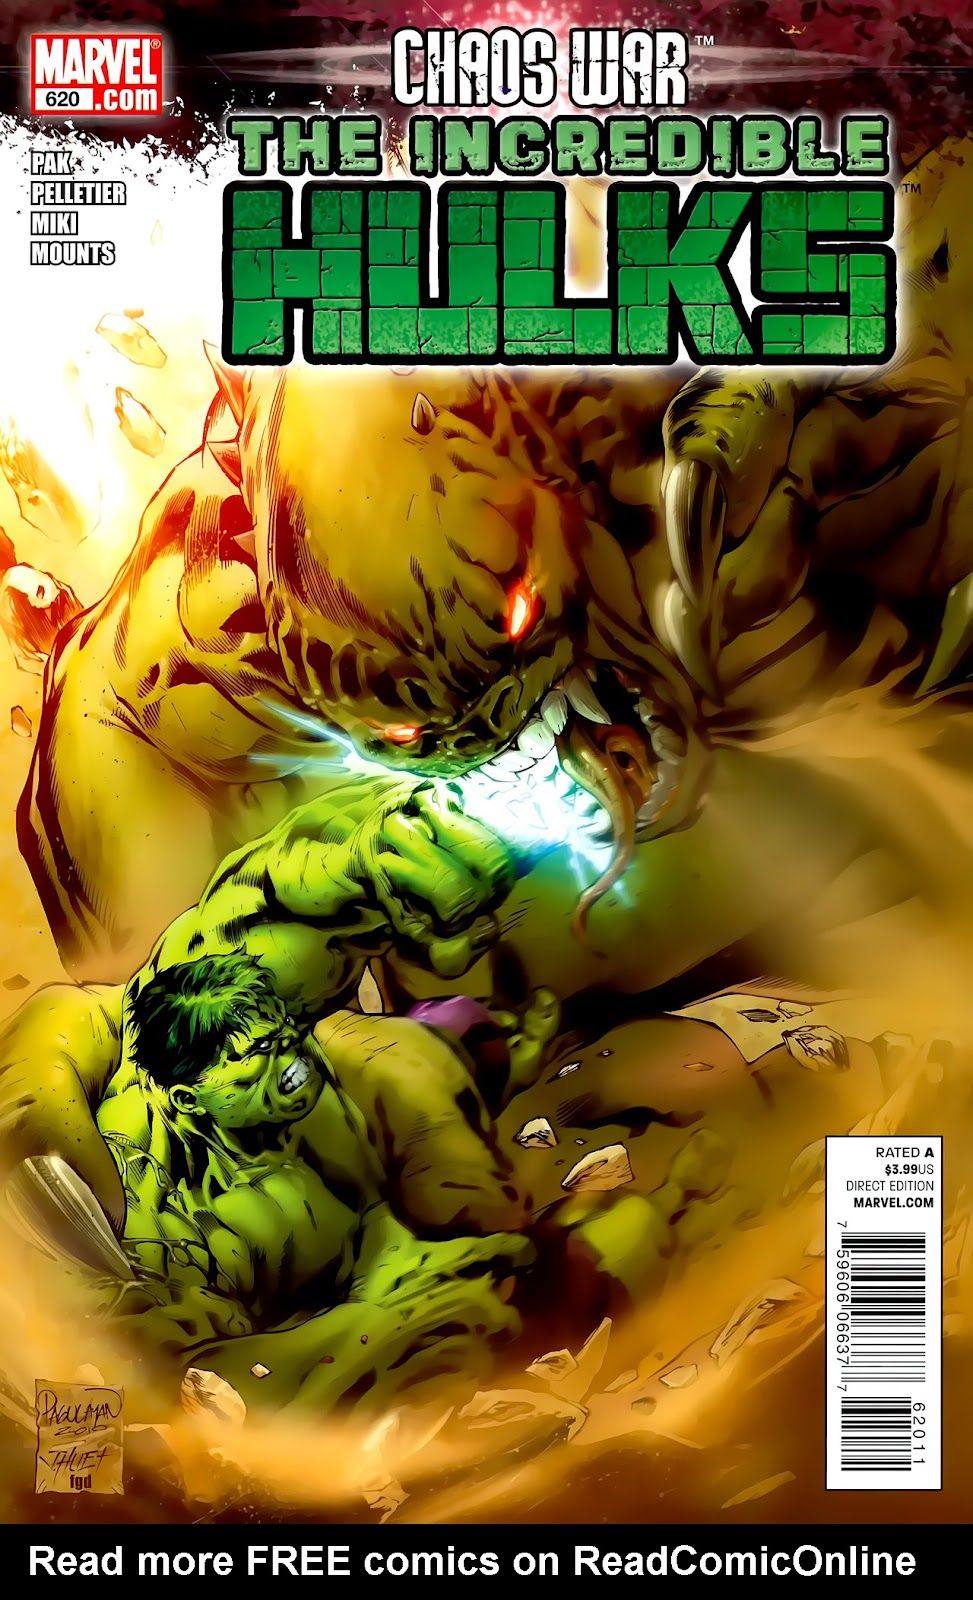 Incredible Hulks (2010) Issue #620 #10 - English 1